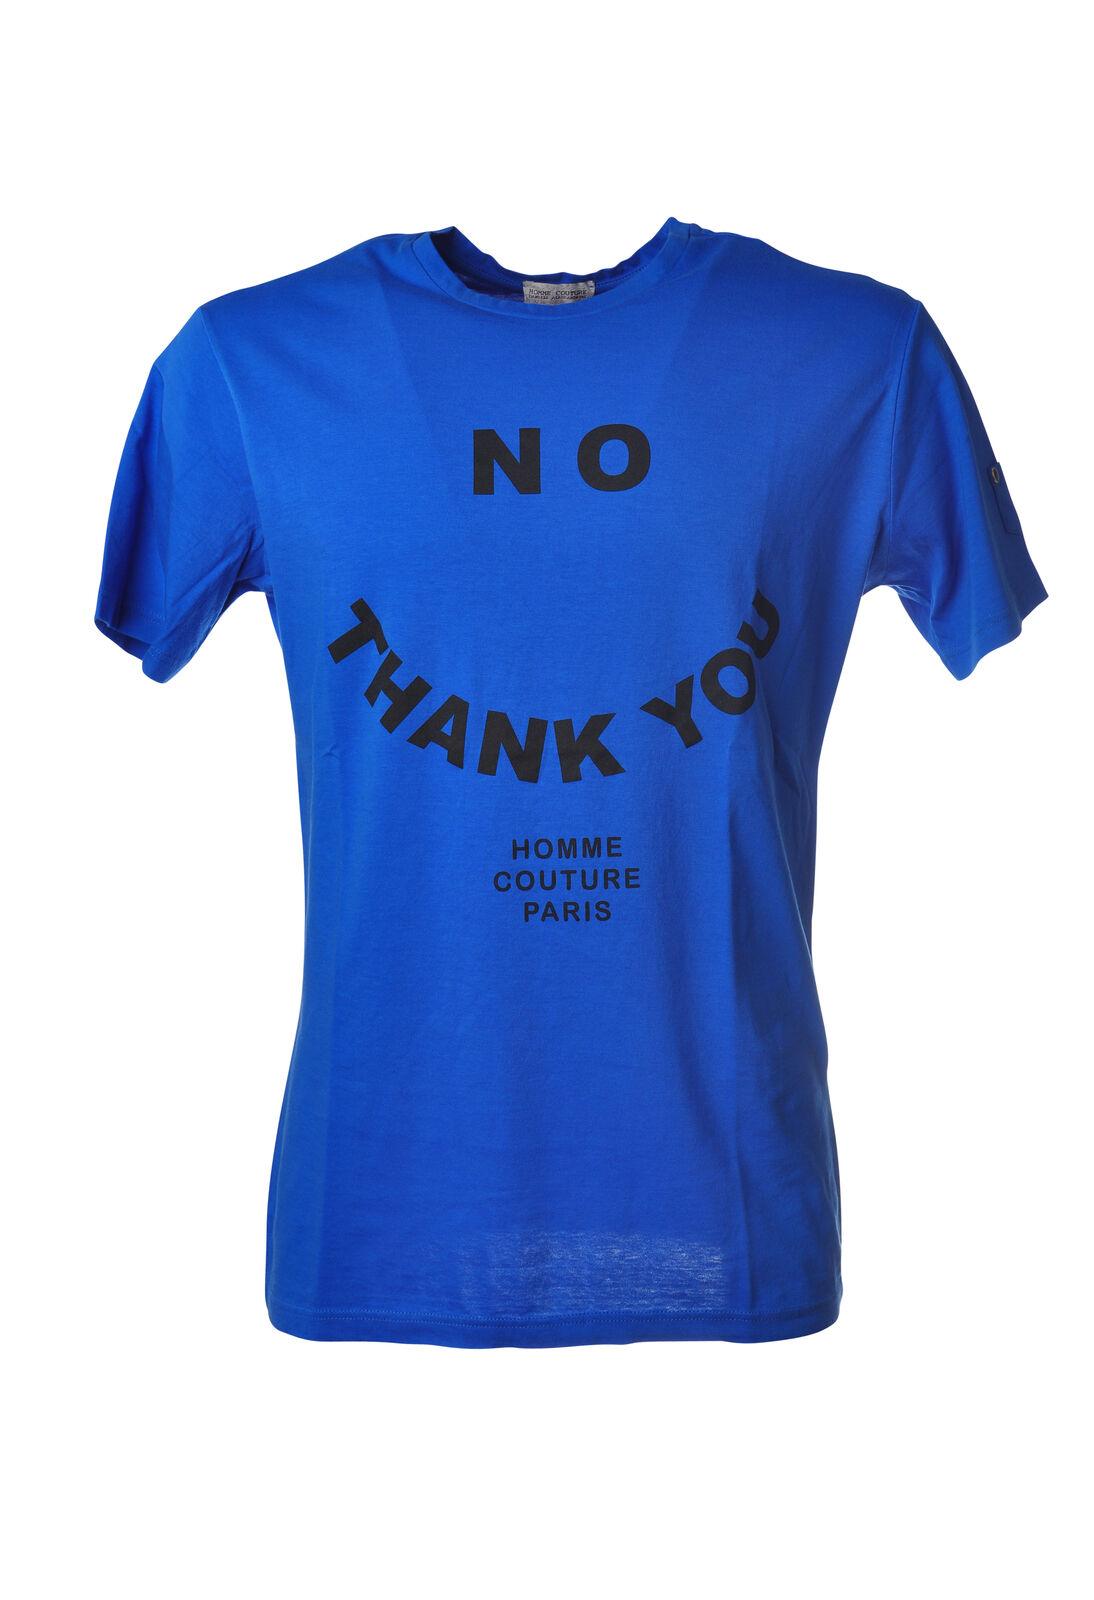 Daniele Alessandrini - Topwear-T-shirts - Man - bluee - 5290105G181953